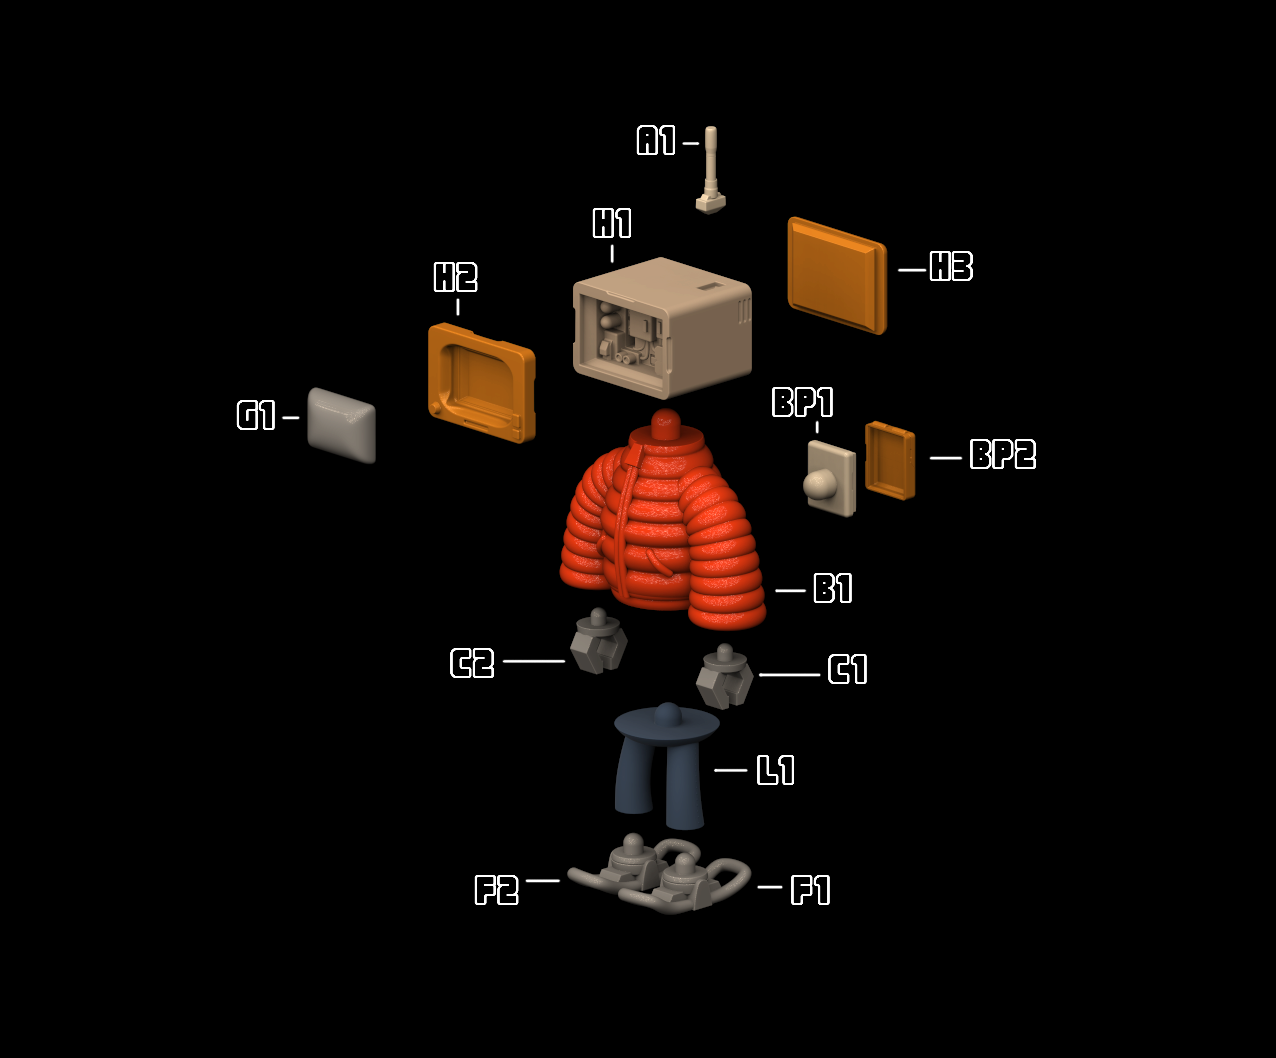 parts.png Download STL file T.B (Thug Bot) • 3D printing model, GGR2